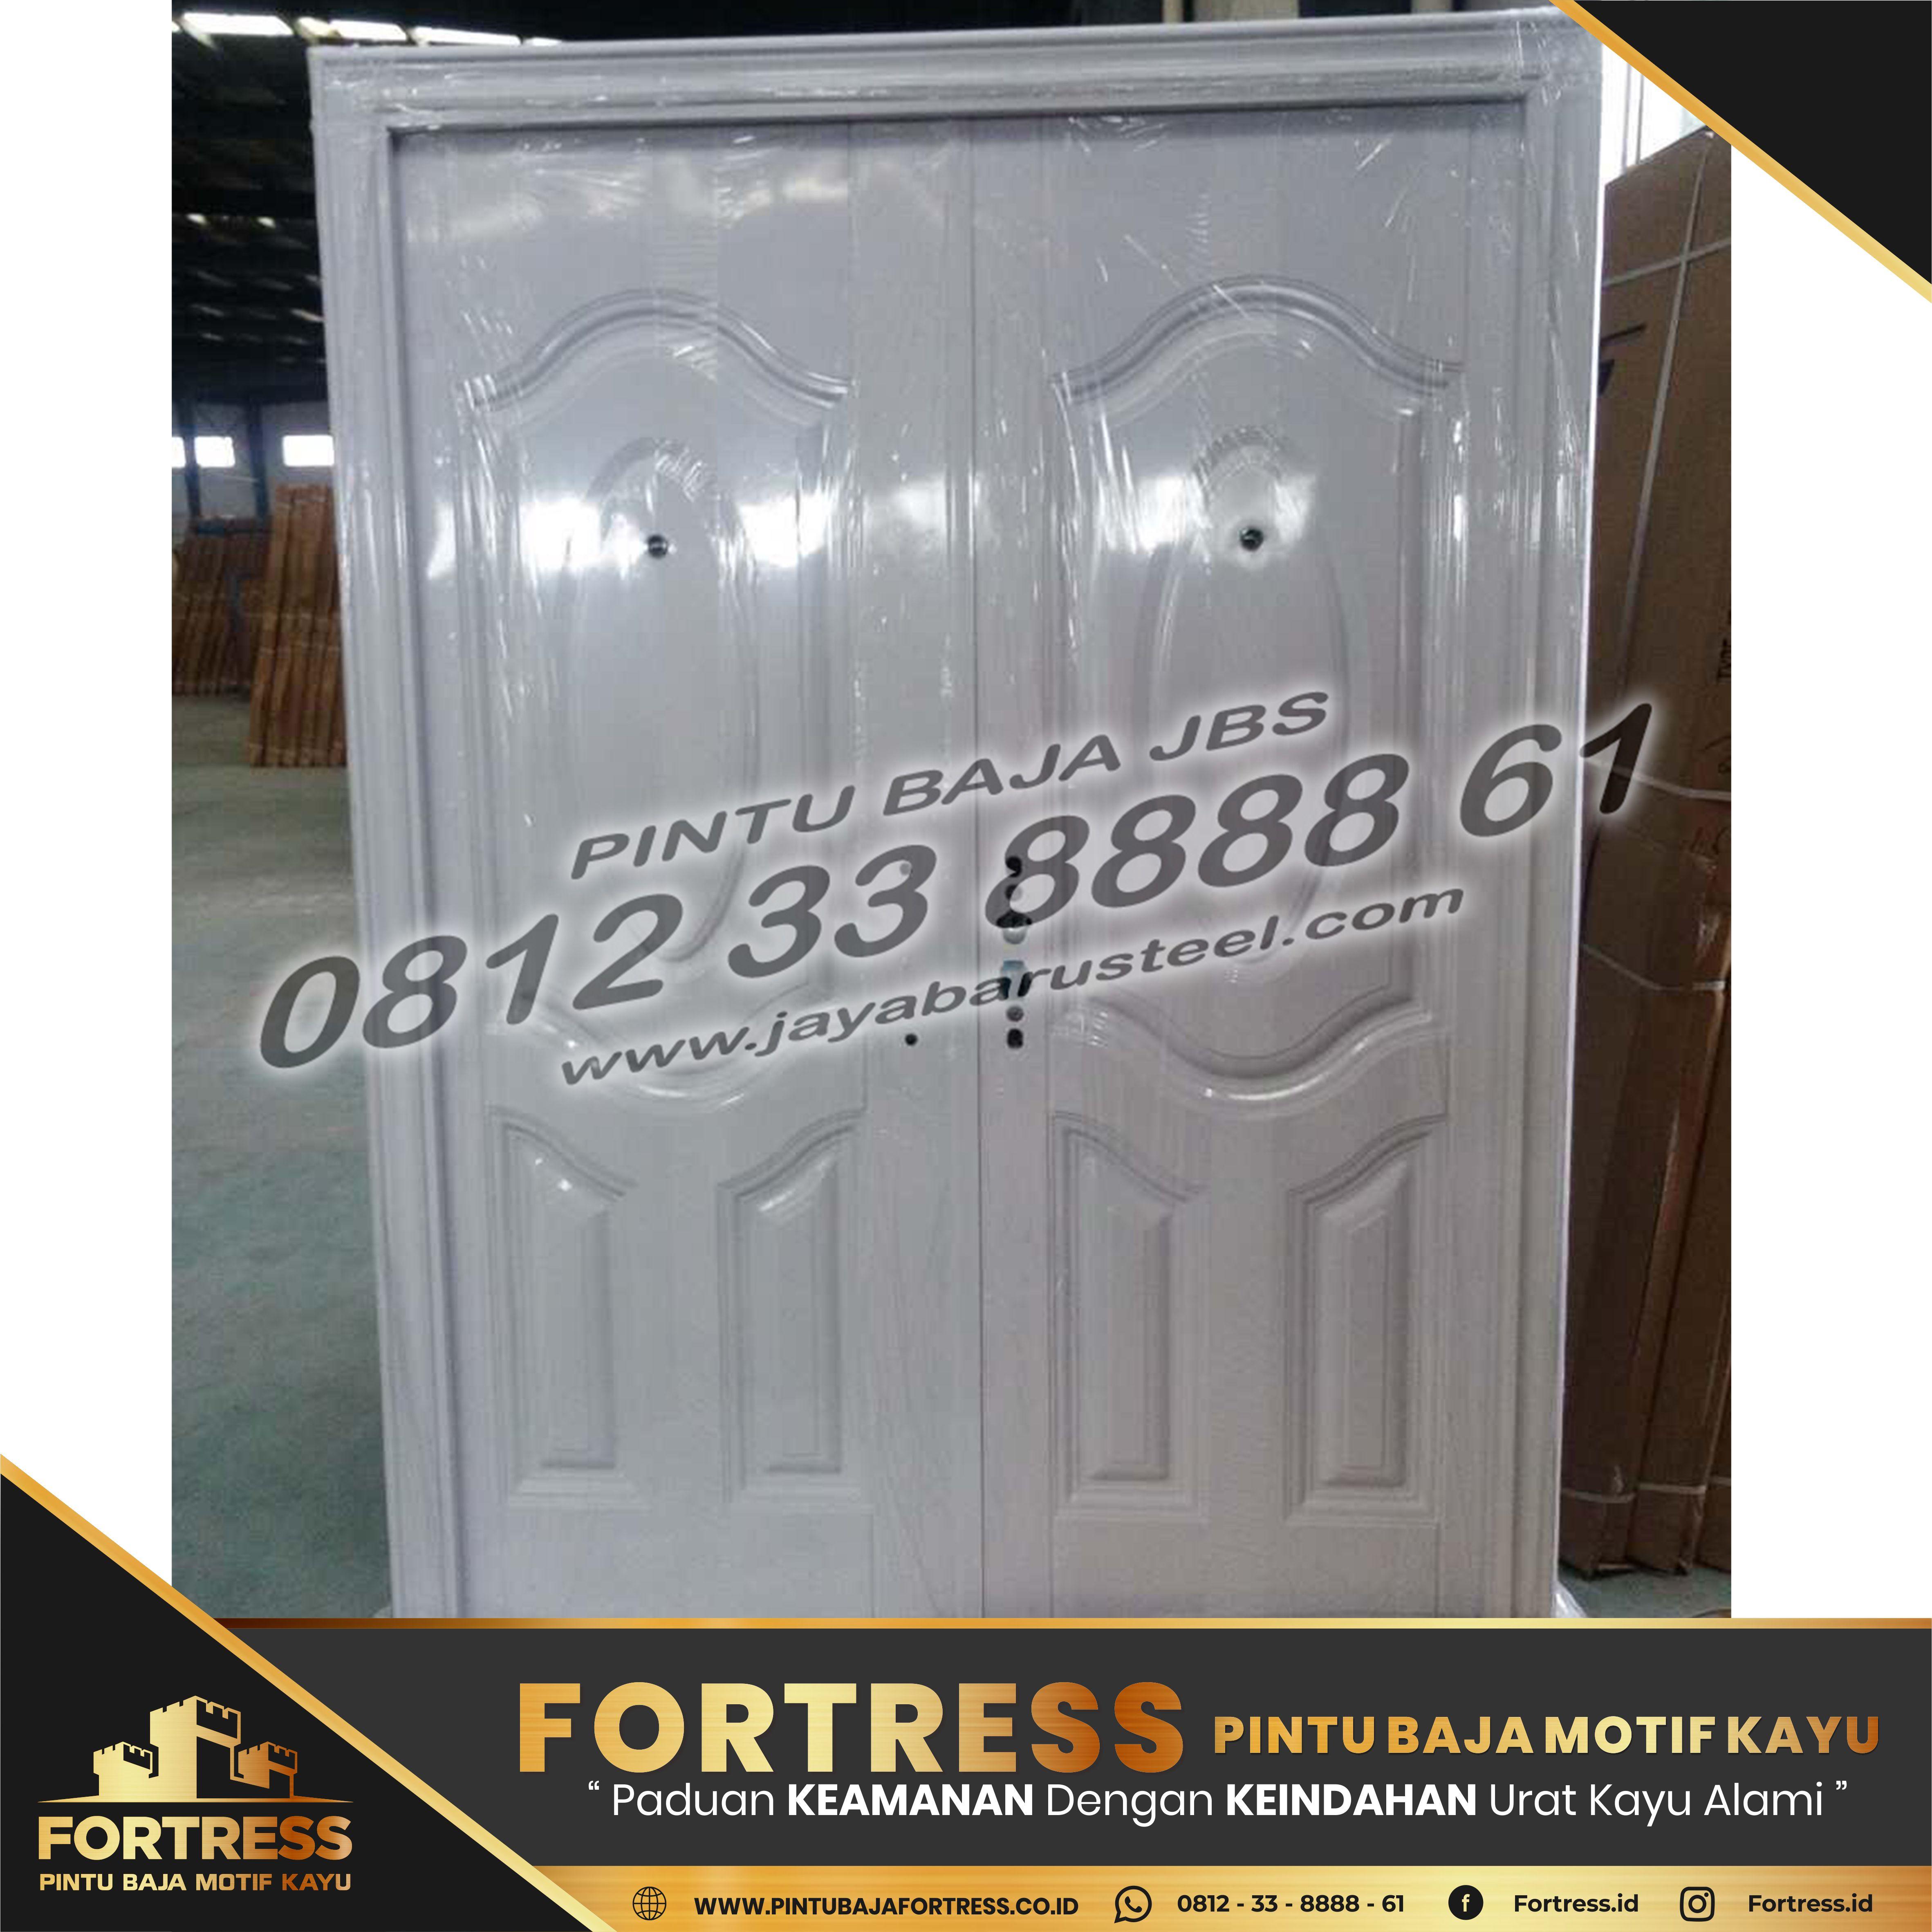 0812-91-6261-07 (FORTRESS) Folding Steel Door CrossKaraya, P …